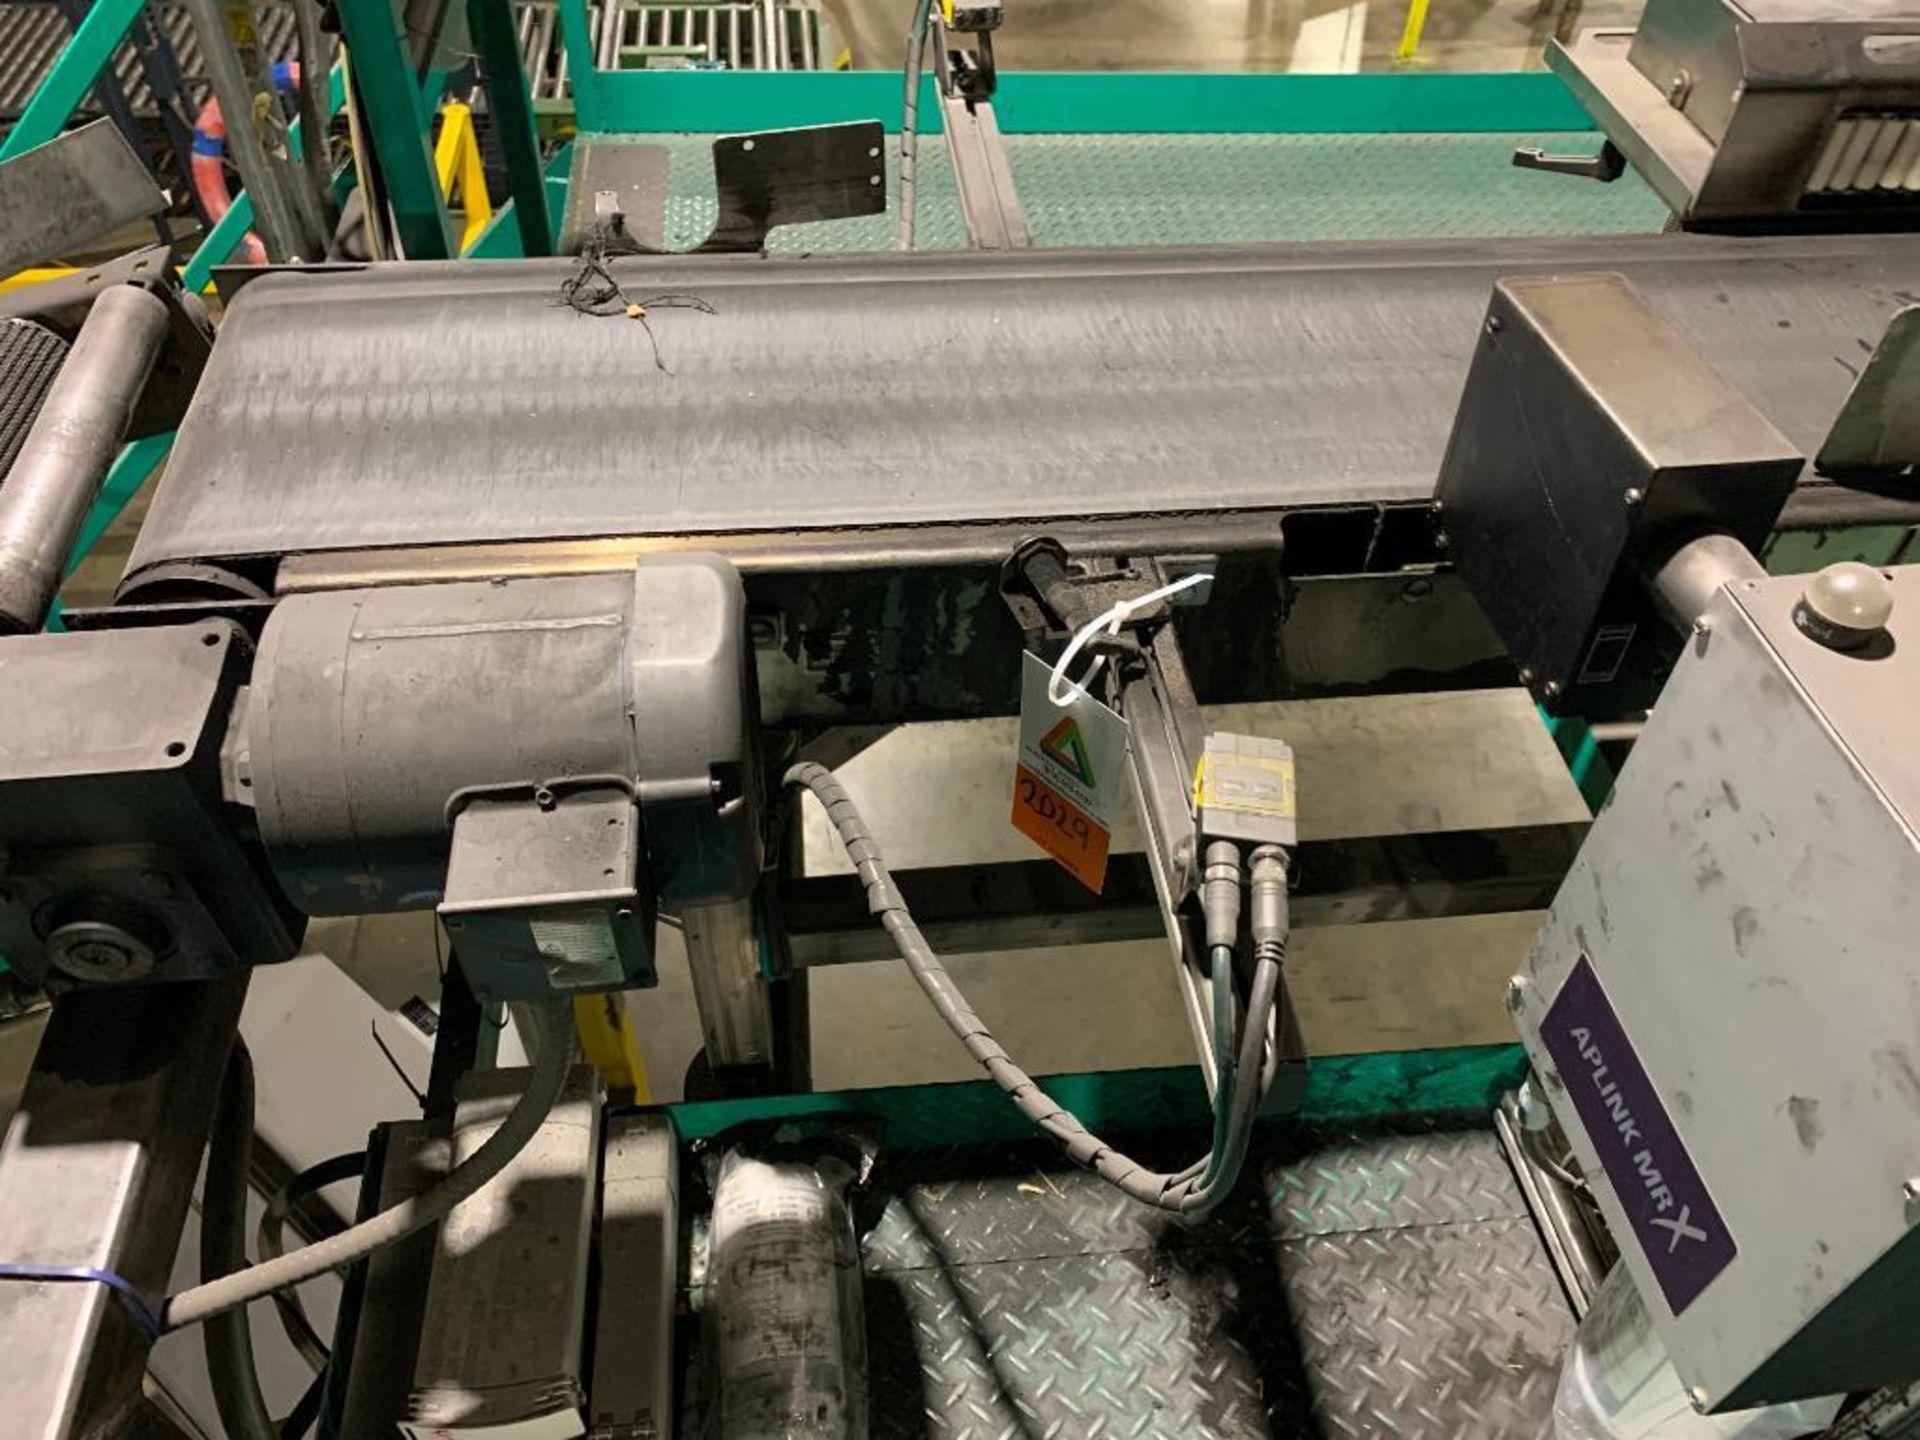 BMI stainless steel conveyor - Image 8 of 14